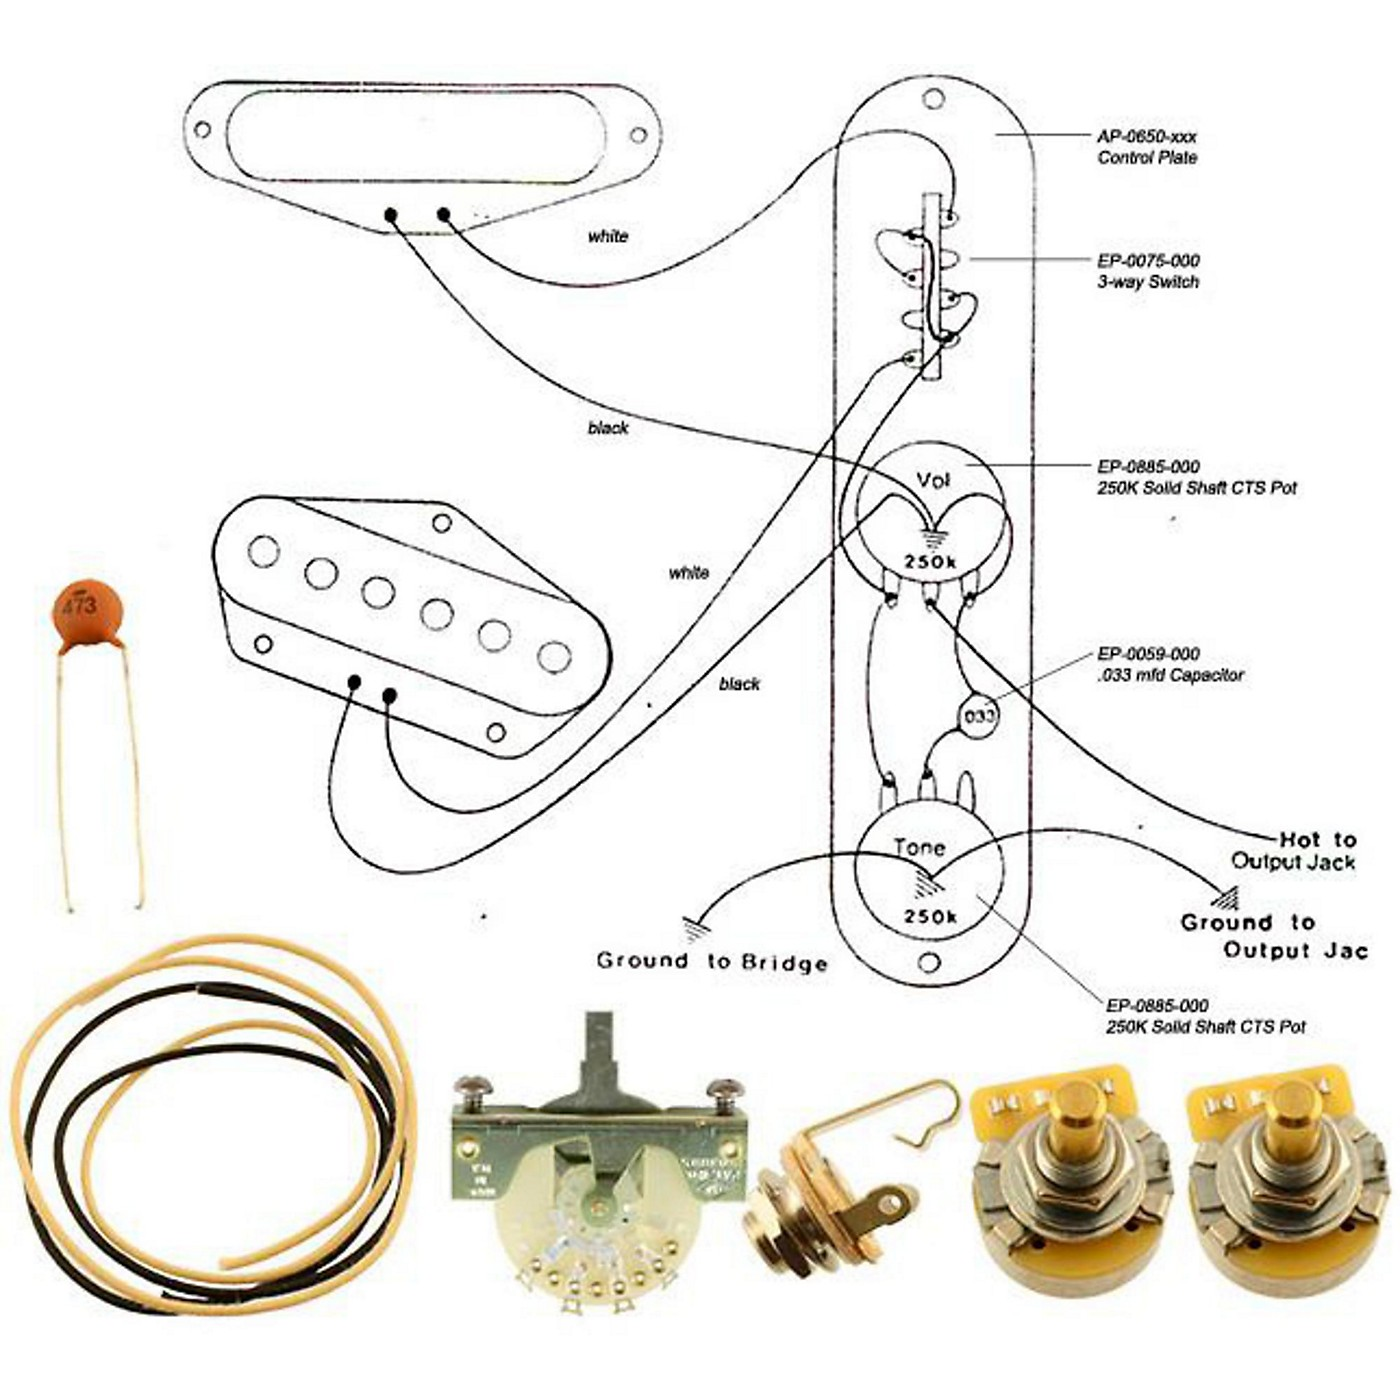 Allparts EP-4131-000 Wiring Kit for Tele Mod thumbnail